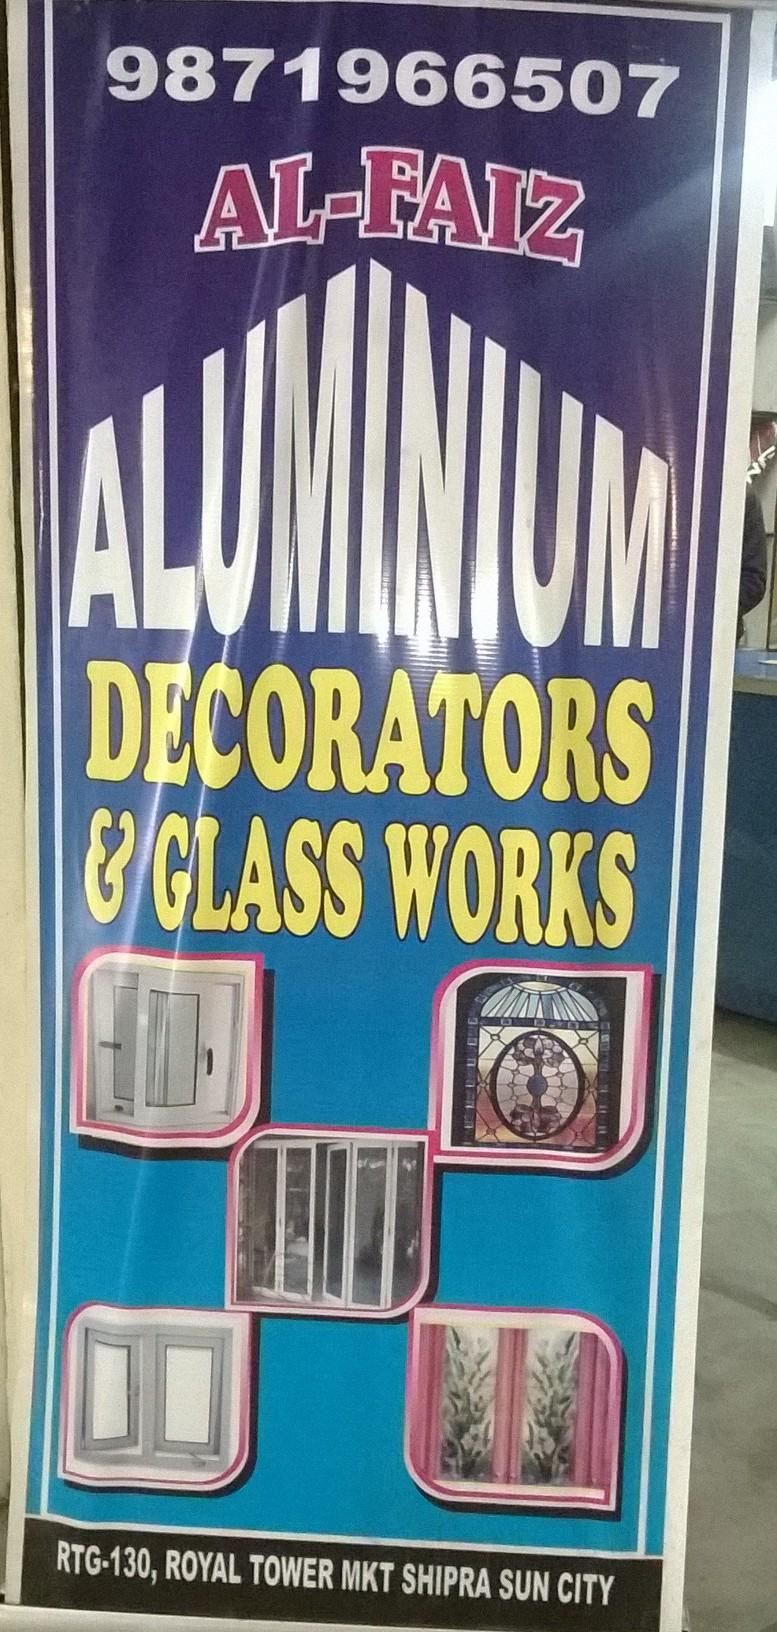 Al-faiz aluminium decorators.